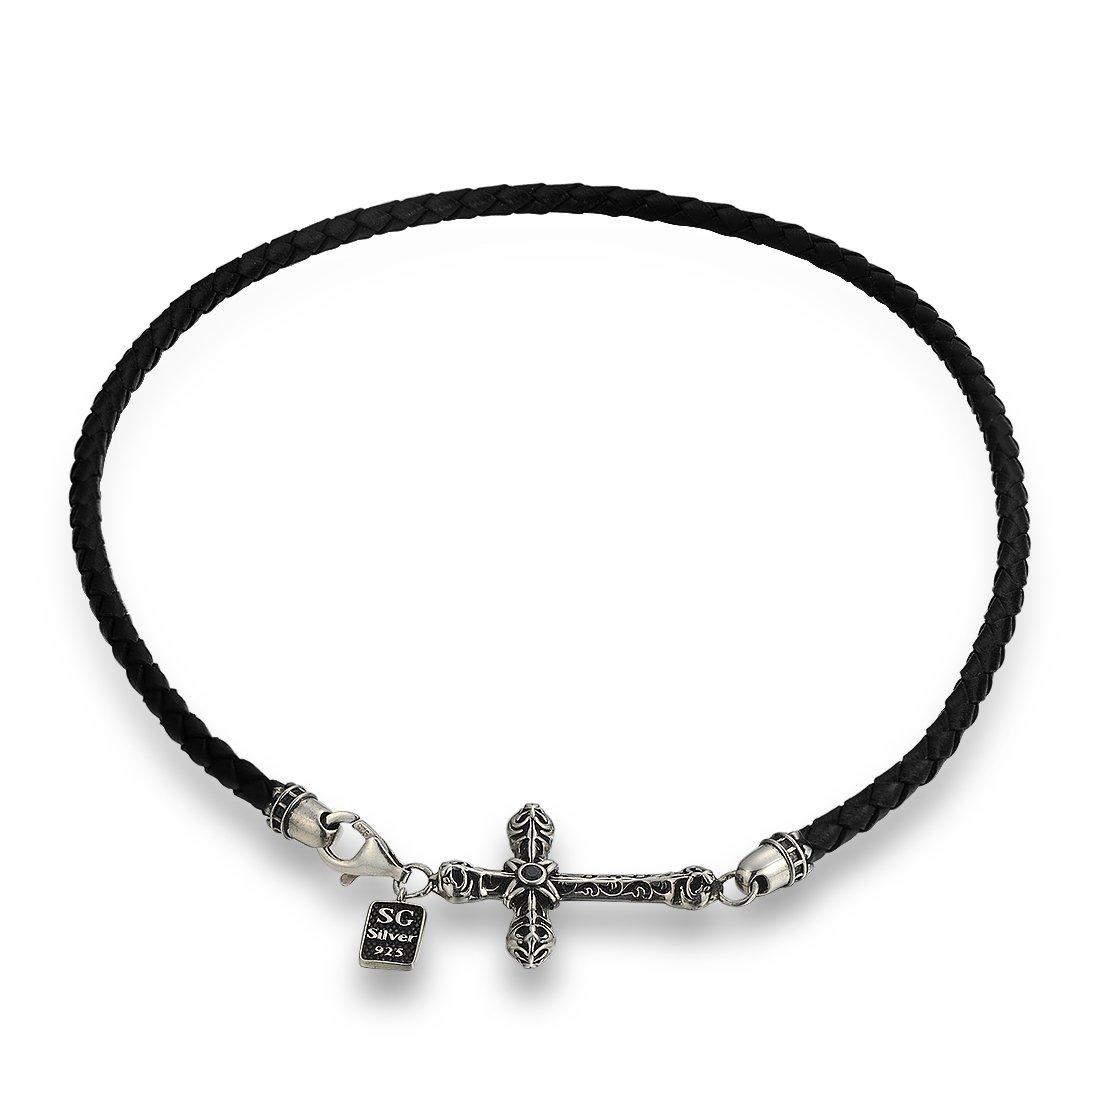 Santuzza Vintage Style Sideways Cross Leather Braided Bracelet Bangle for Women Men Sterling Silver Genuine Leather Braided Double Strap